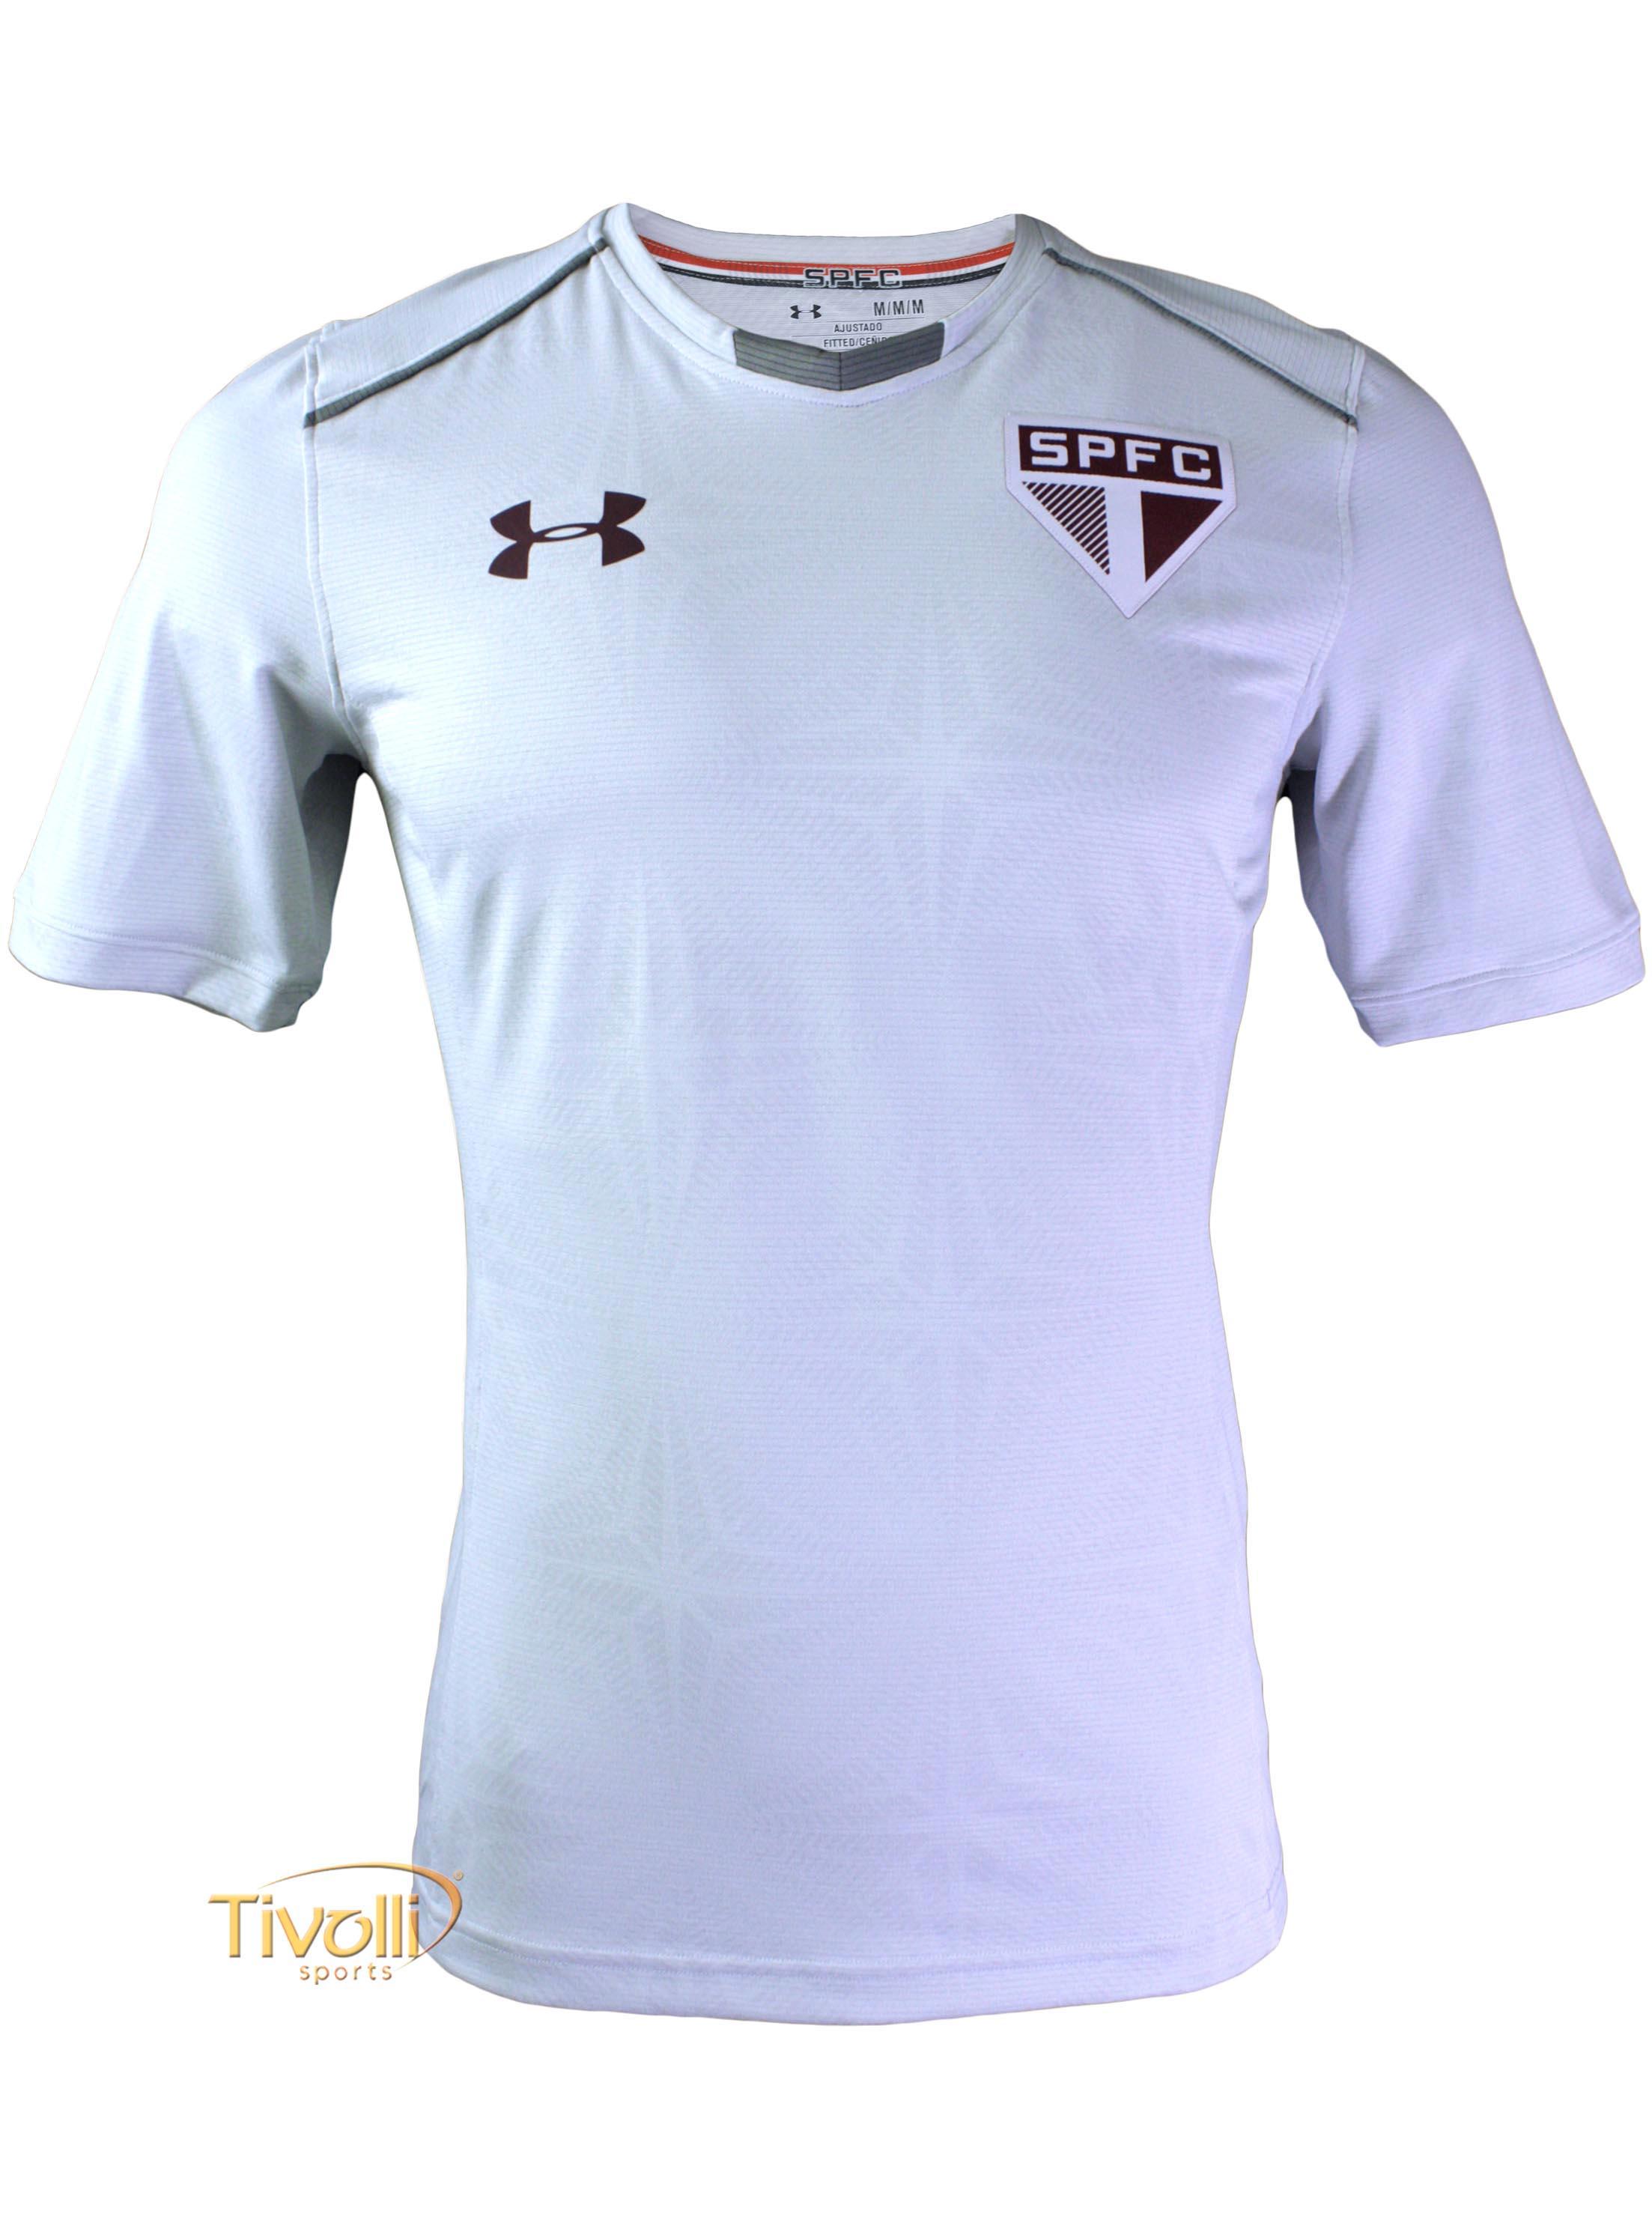 e3655039b35 Camisa Treino São Paulo SPFC 2017 Under Armour